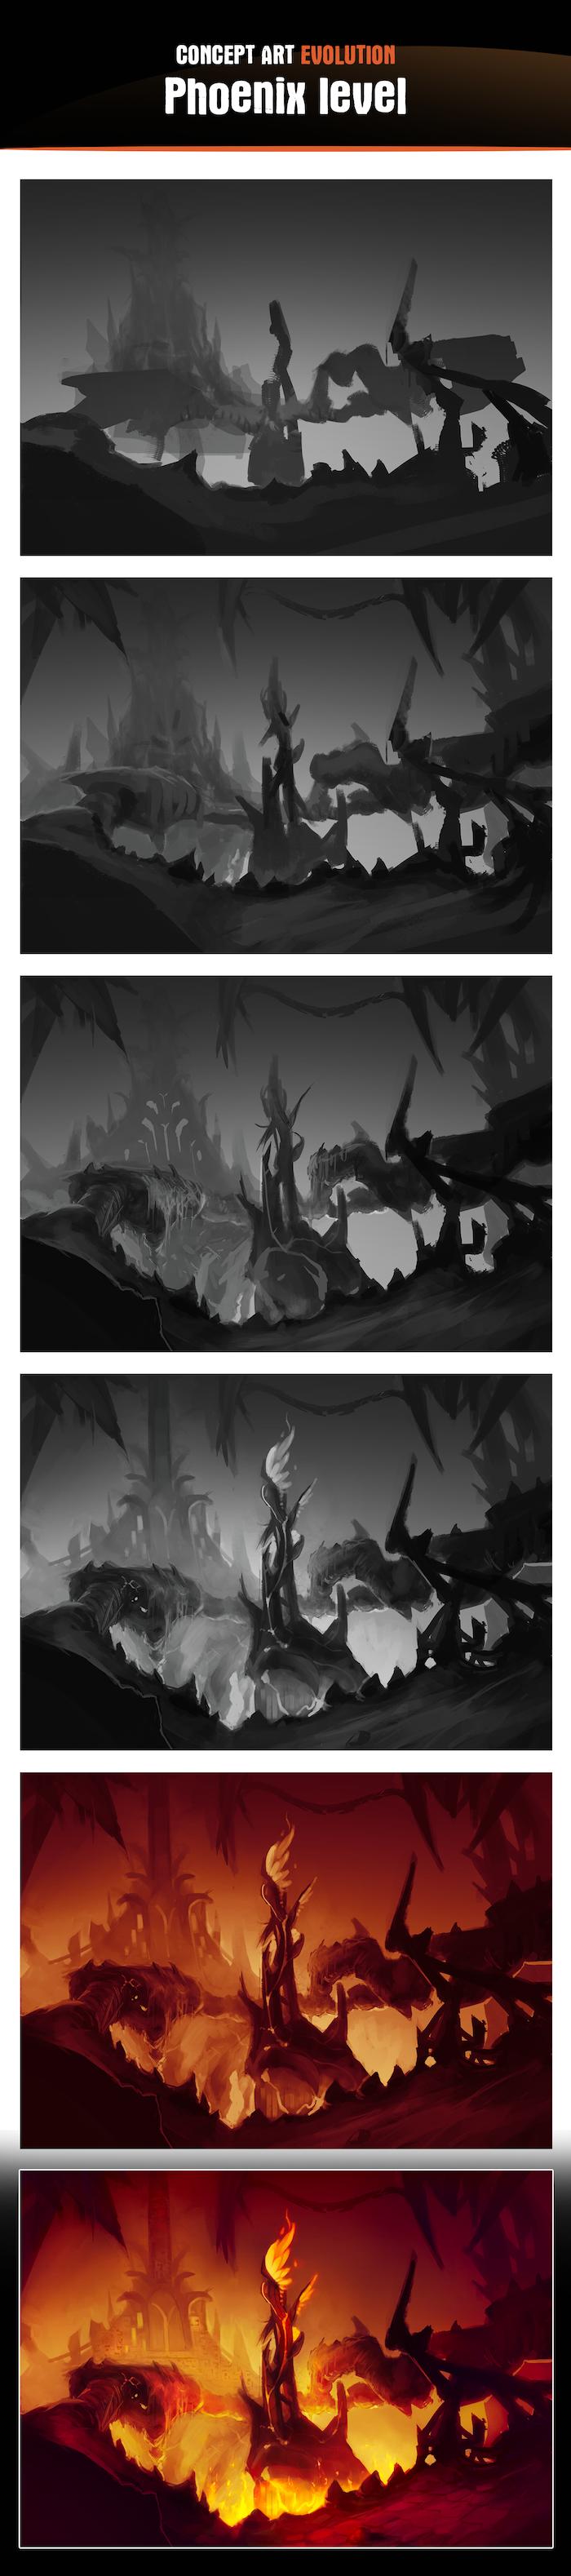 Nephil's Fall by Exordium Games — Kickstarter